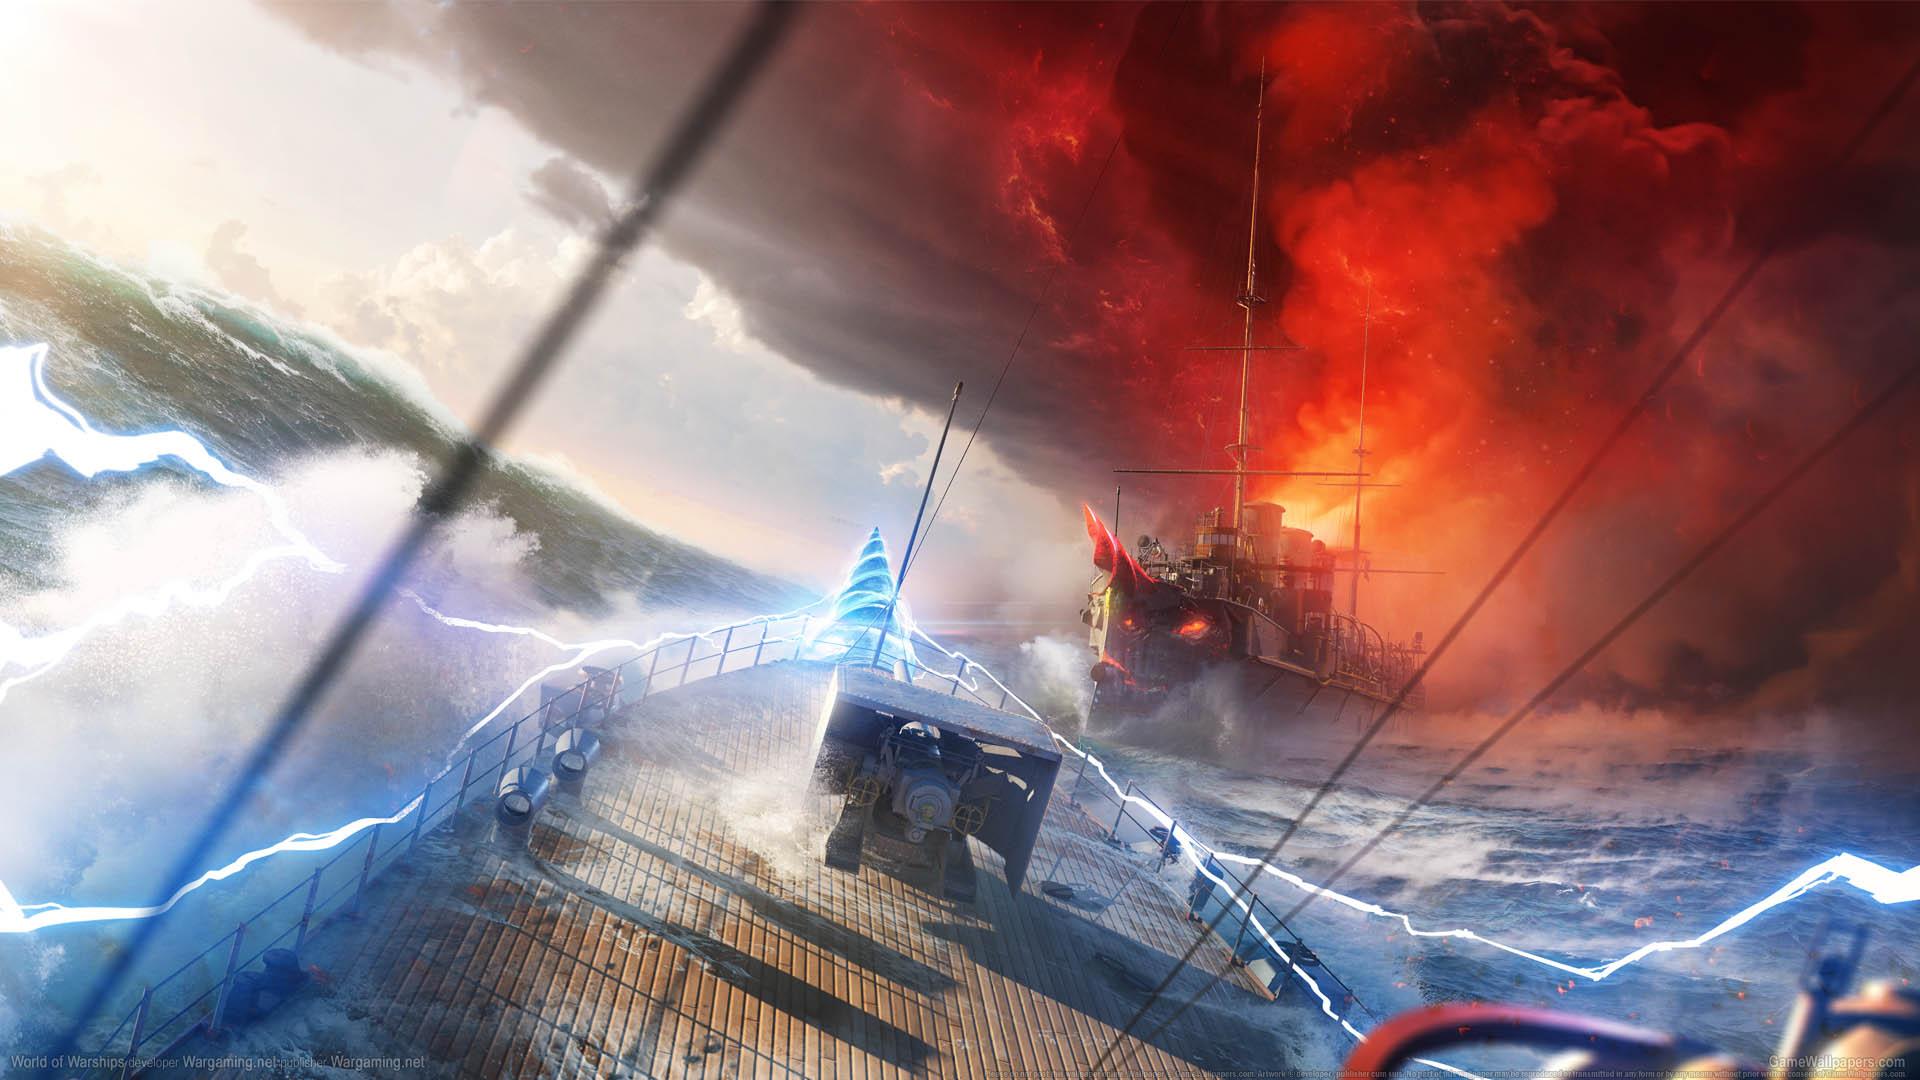 World of Warships fond d'écran 21 1920x1080